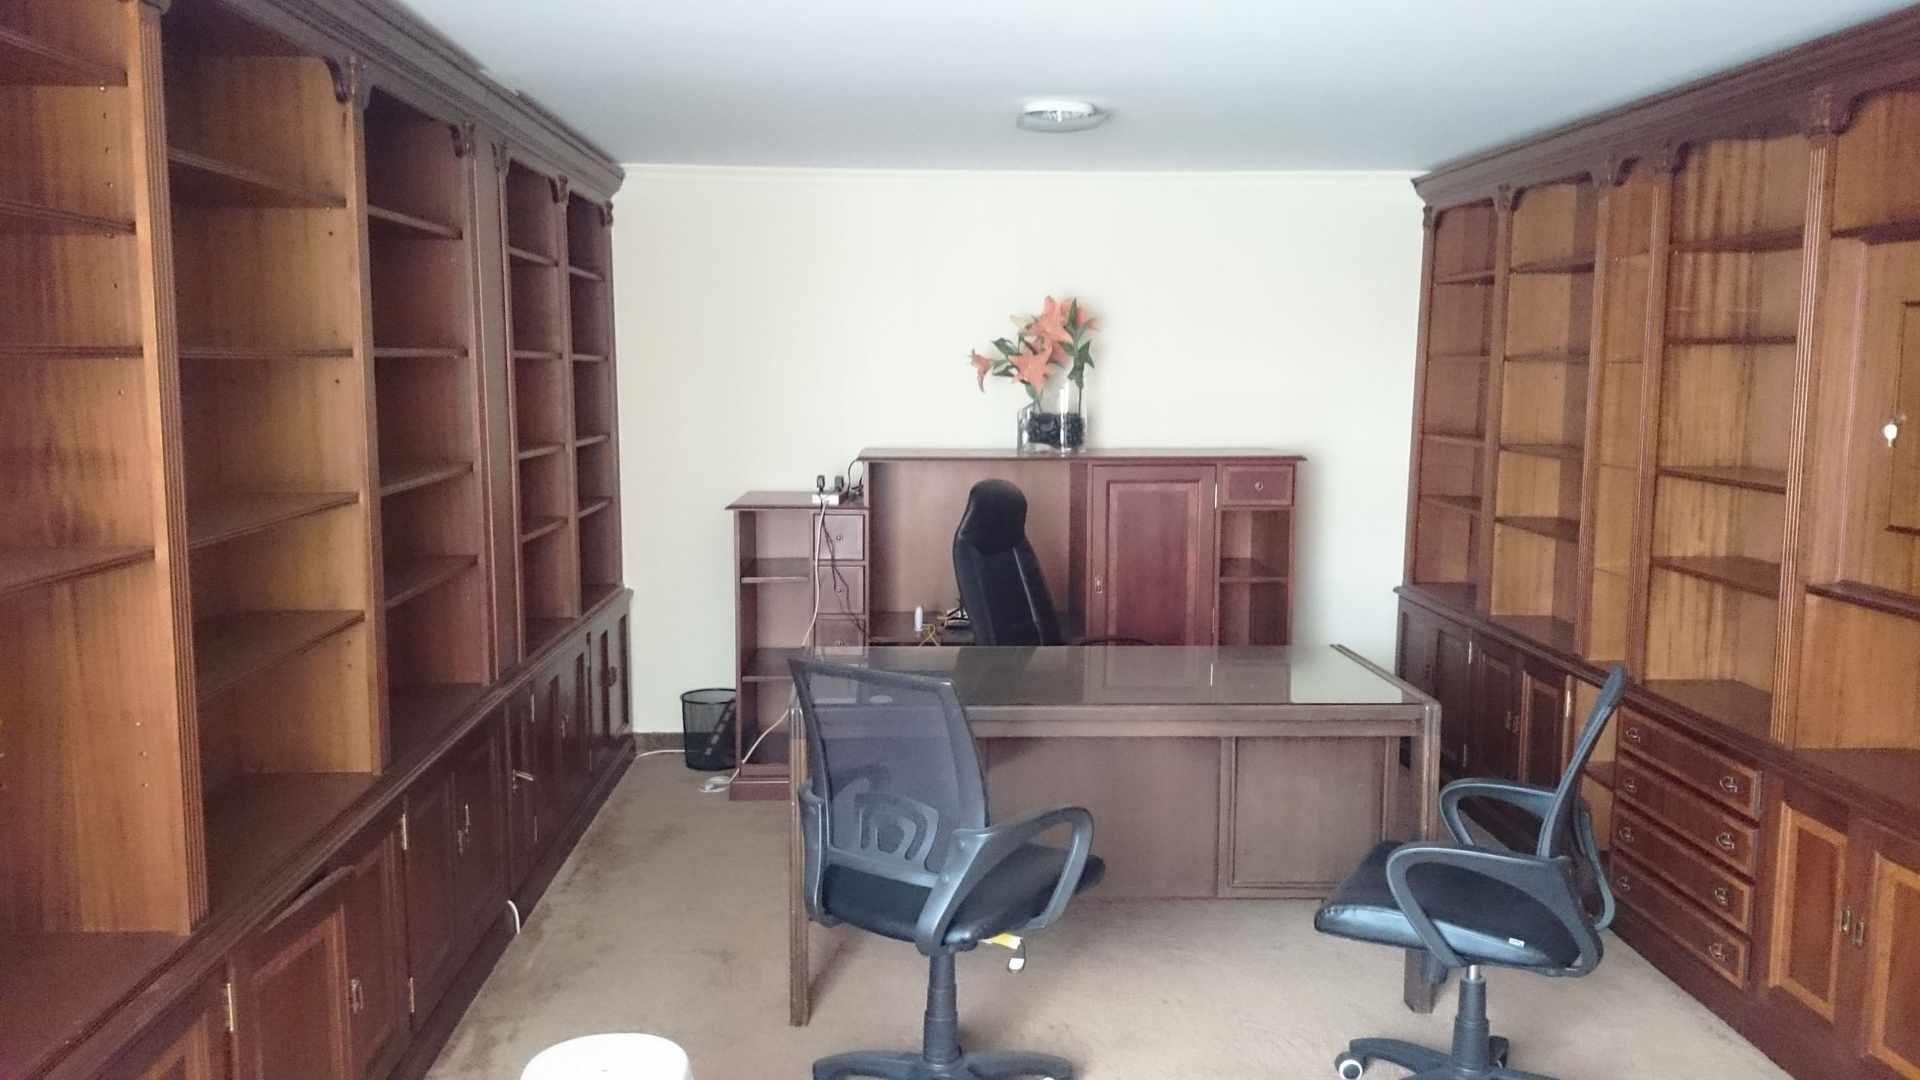 Departamento en Alquiler CALACOTO EXCELENTE  DEPARTAMENTO MODERNO AMOBLADO Foto 7